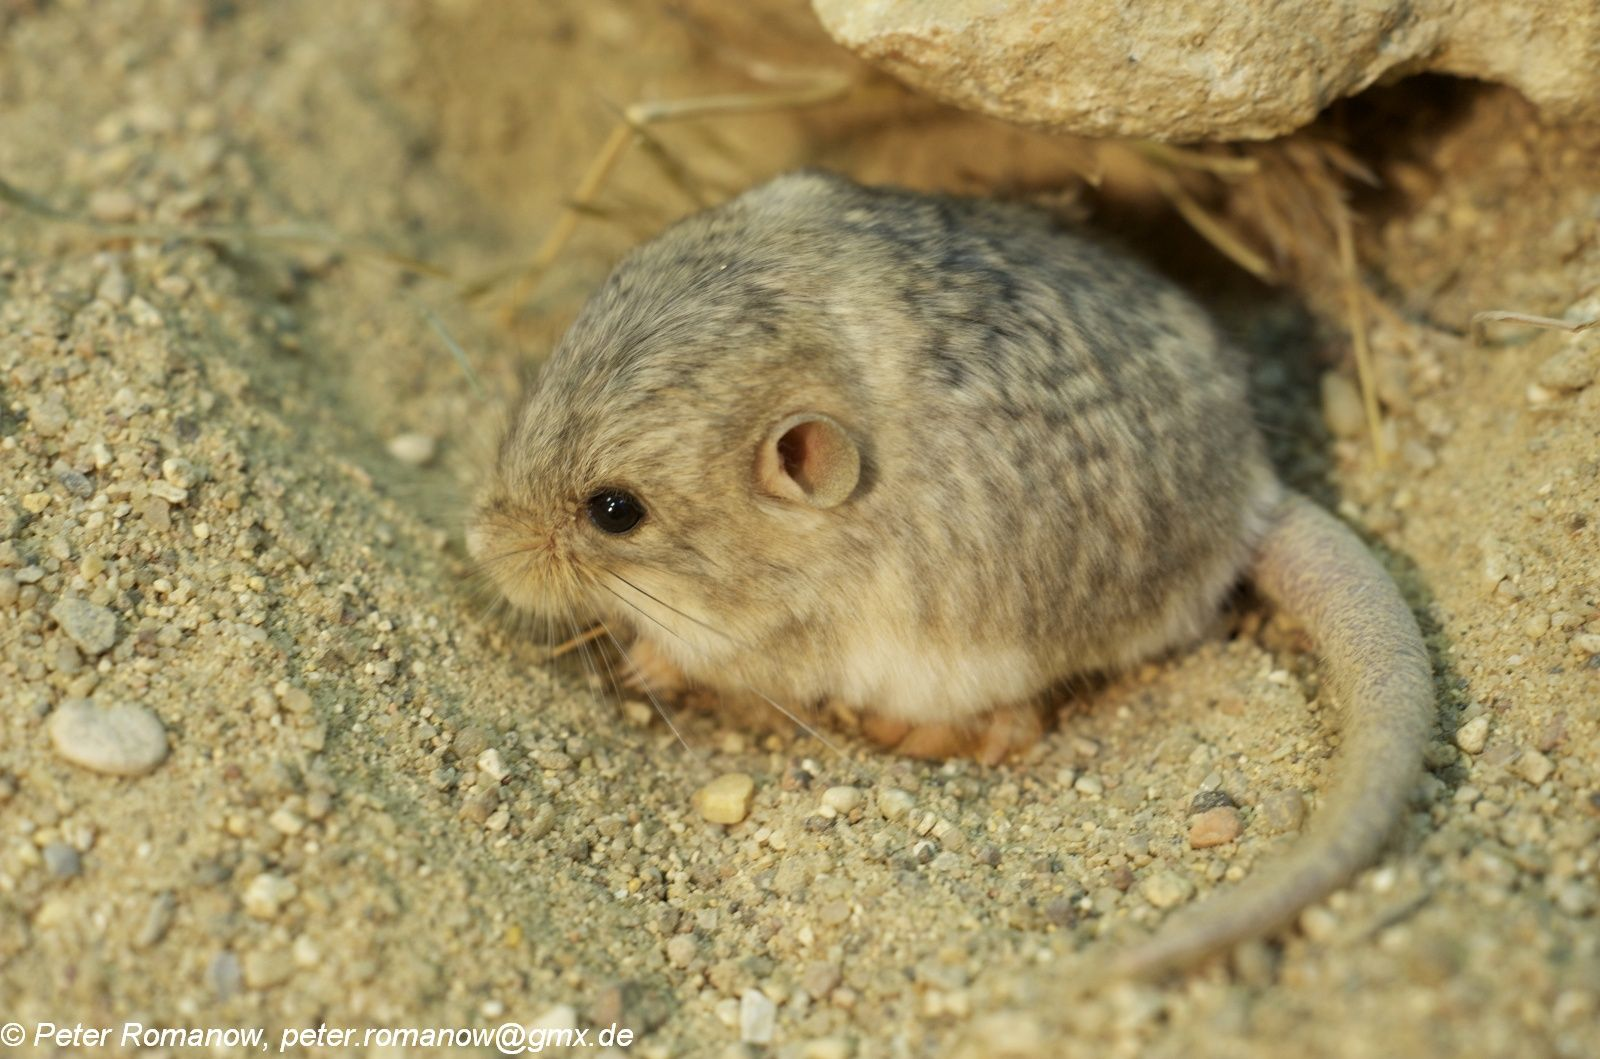 Cardiocranius paradoxus - Five-toed Pygmy Jerboa   Animals ... - photo#7